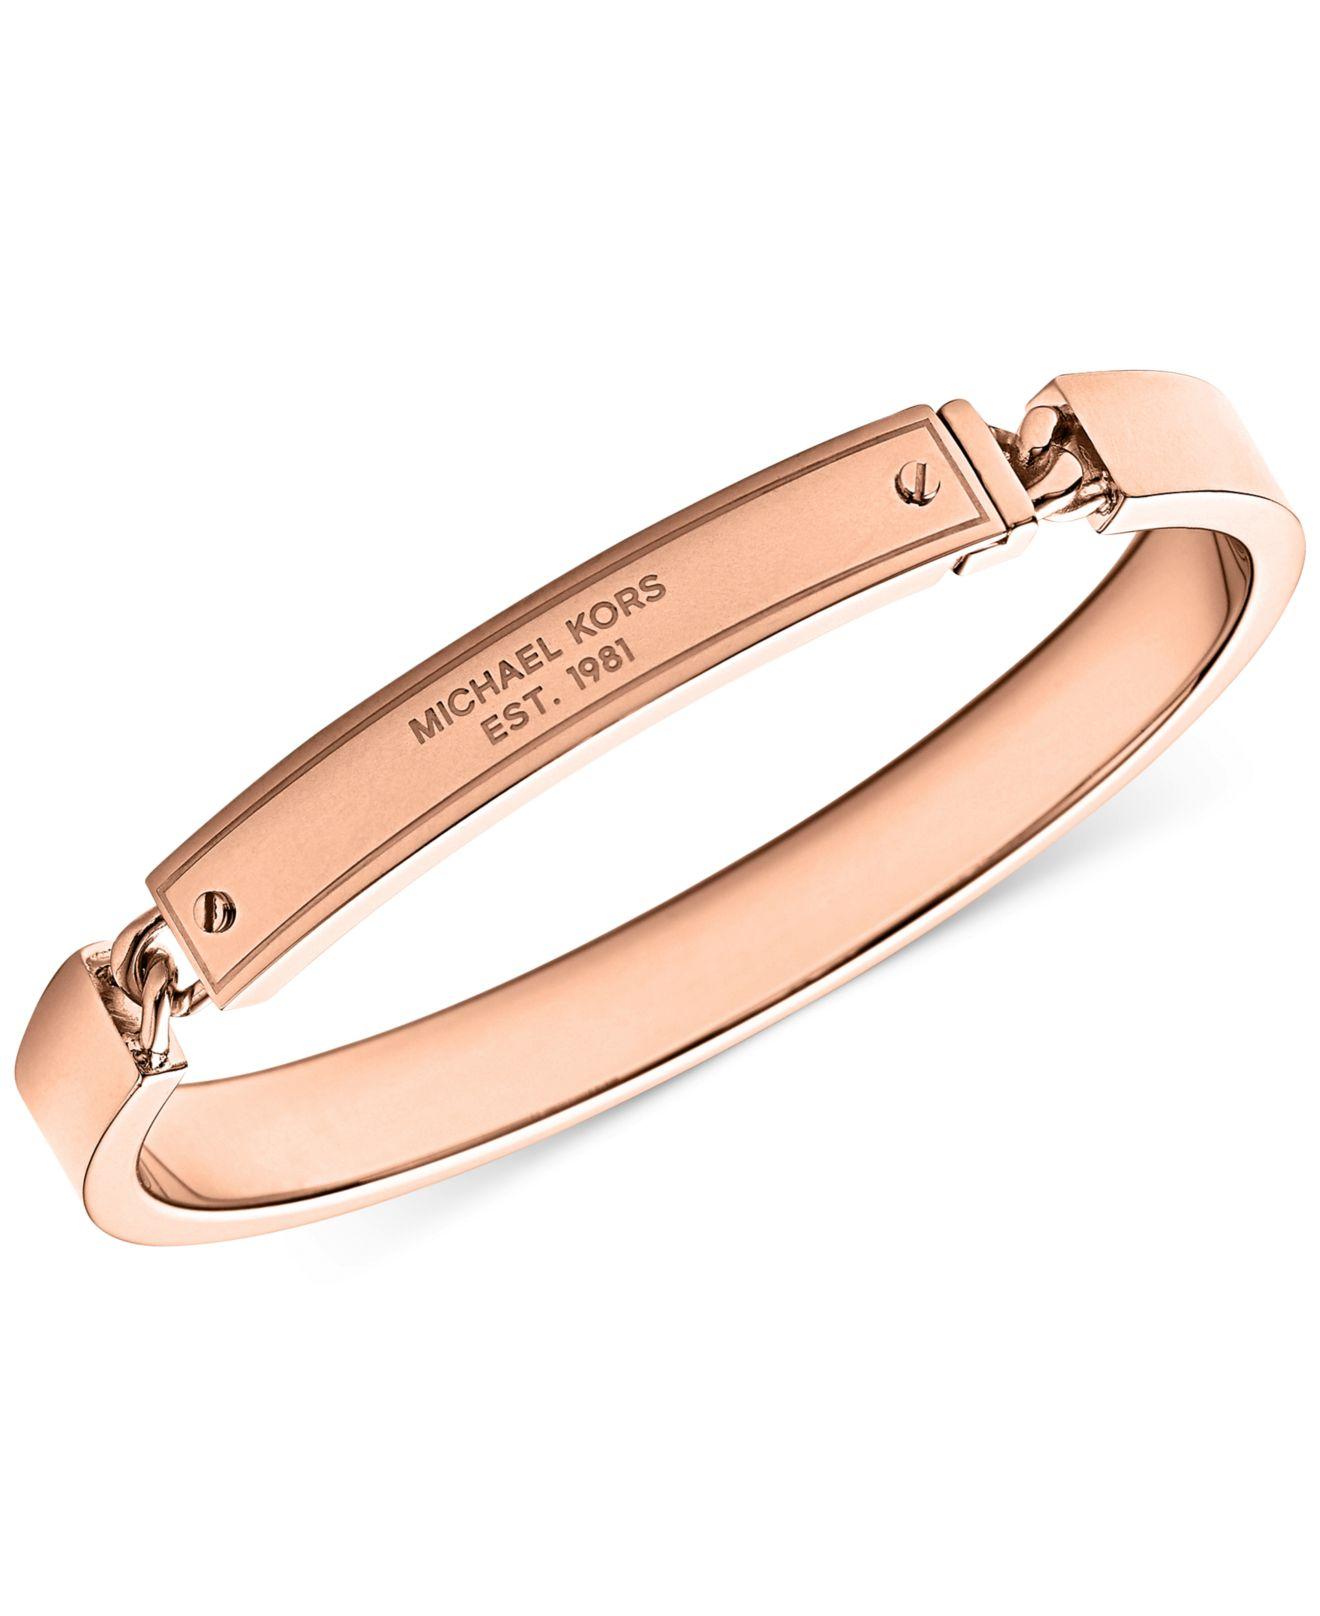 michael kors plaque curb hinge bangle bracelet a macys